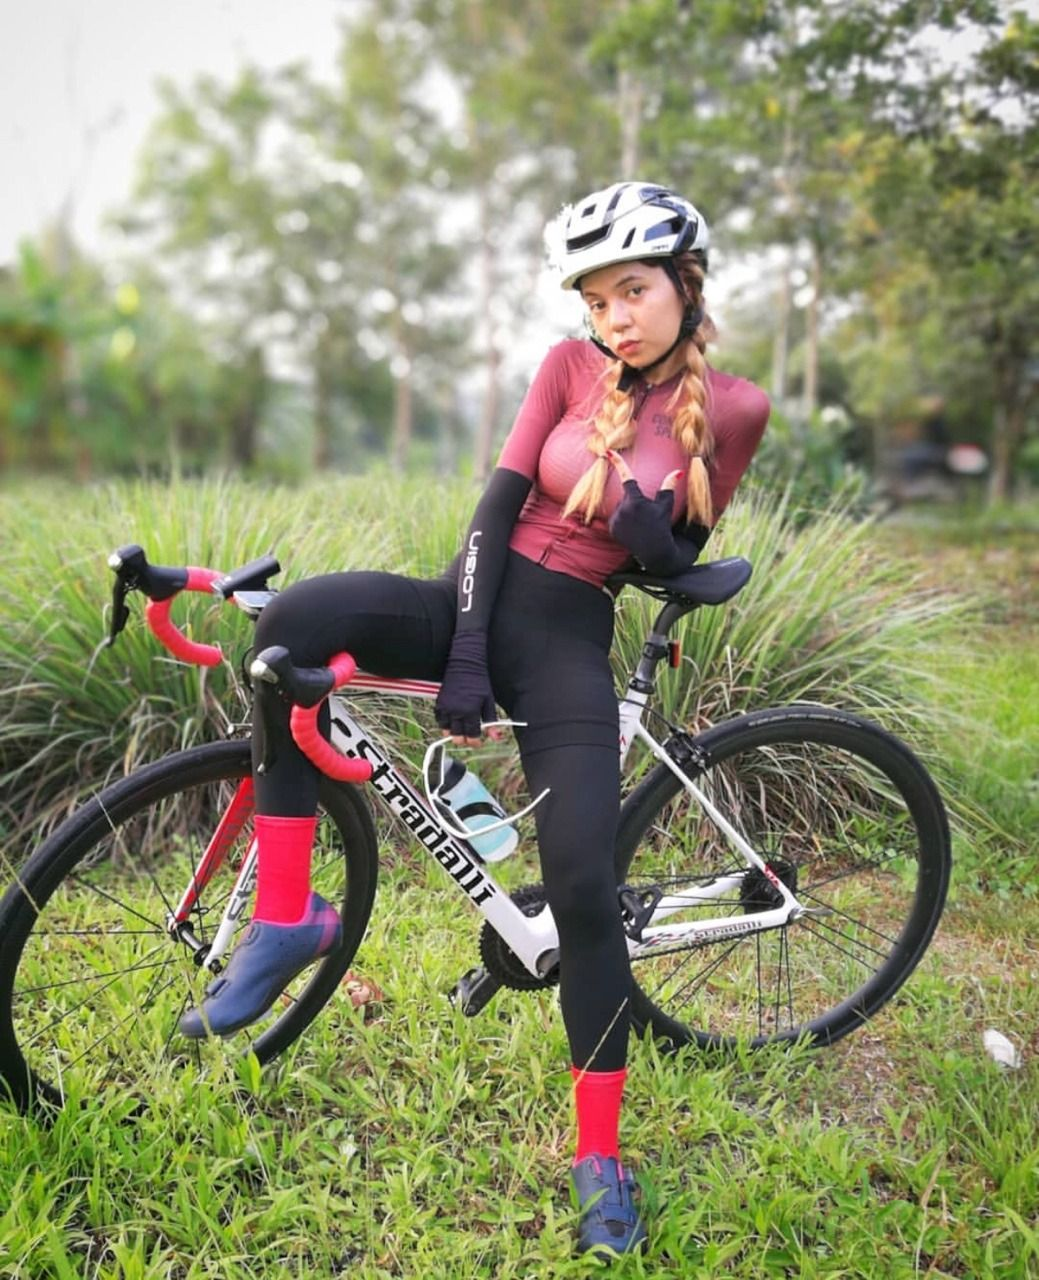 Pin By Al Bayu Ajie On Bikes The Ladies Cycling Women Cycling Girls Bicycle Girl